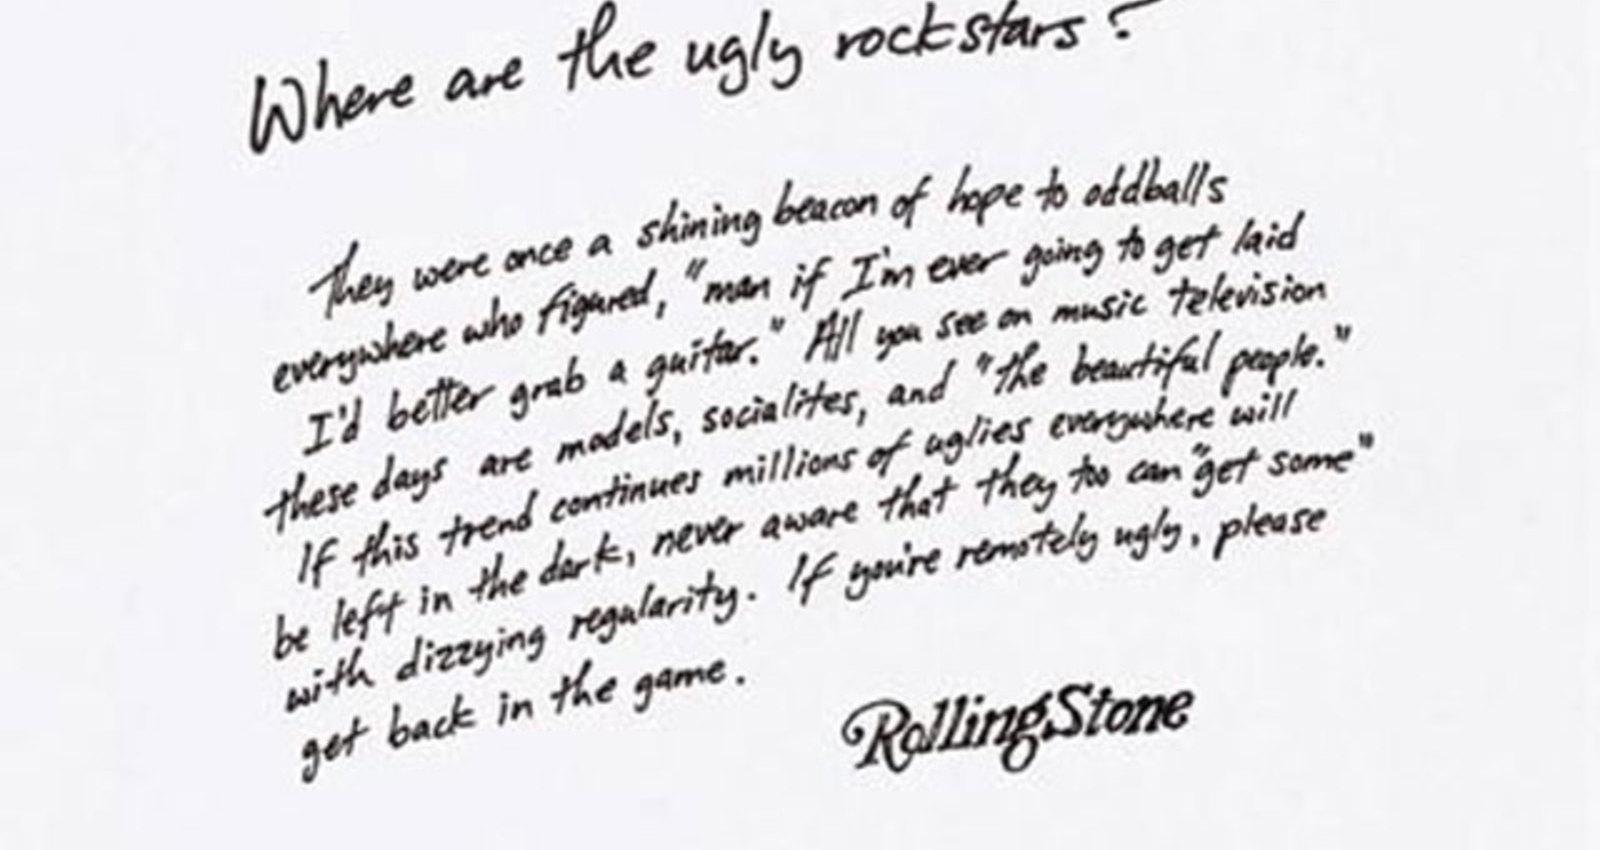 Ugly Rockstars, Live Fast Die a Senior Citizen, 666 Petalicious